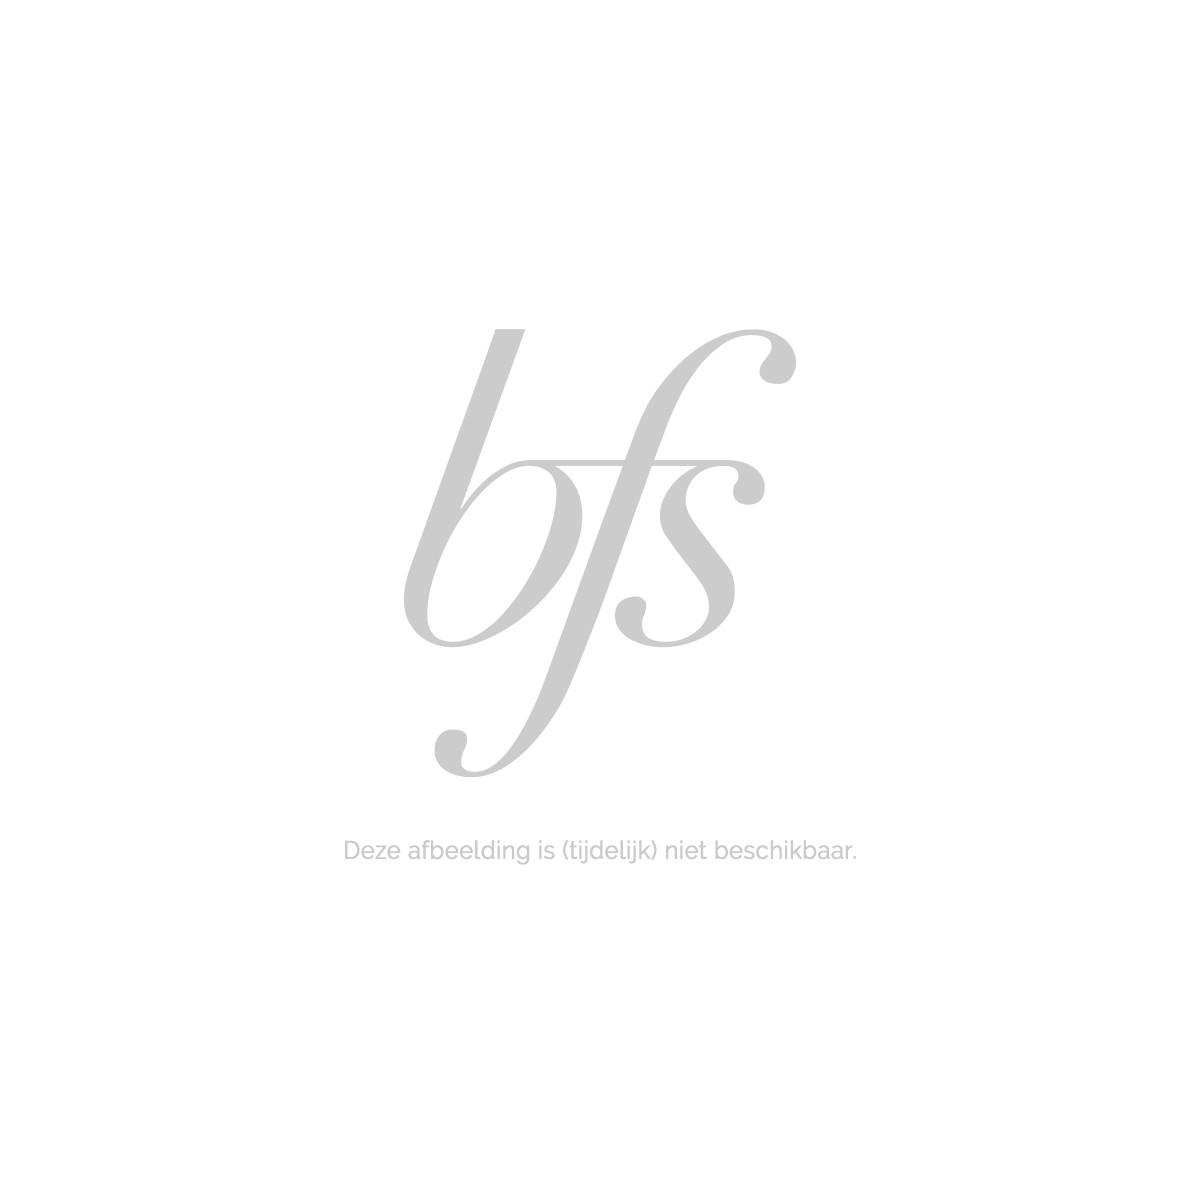 Hildegard Braukmann Exquisit Moisturising Cream Sensitive Skin 50 ml